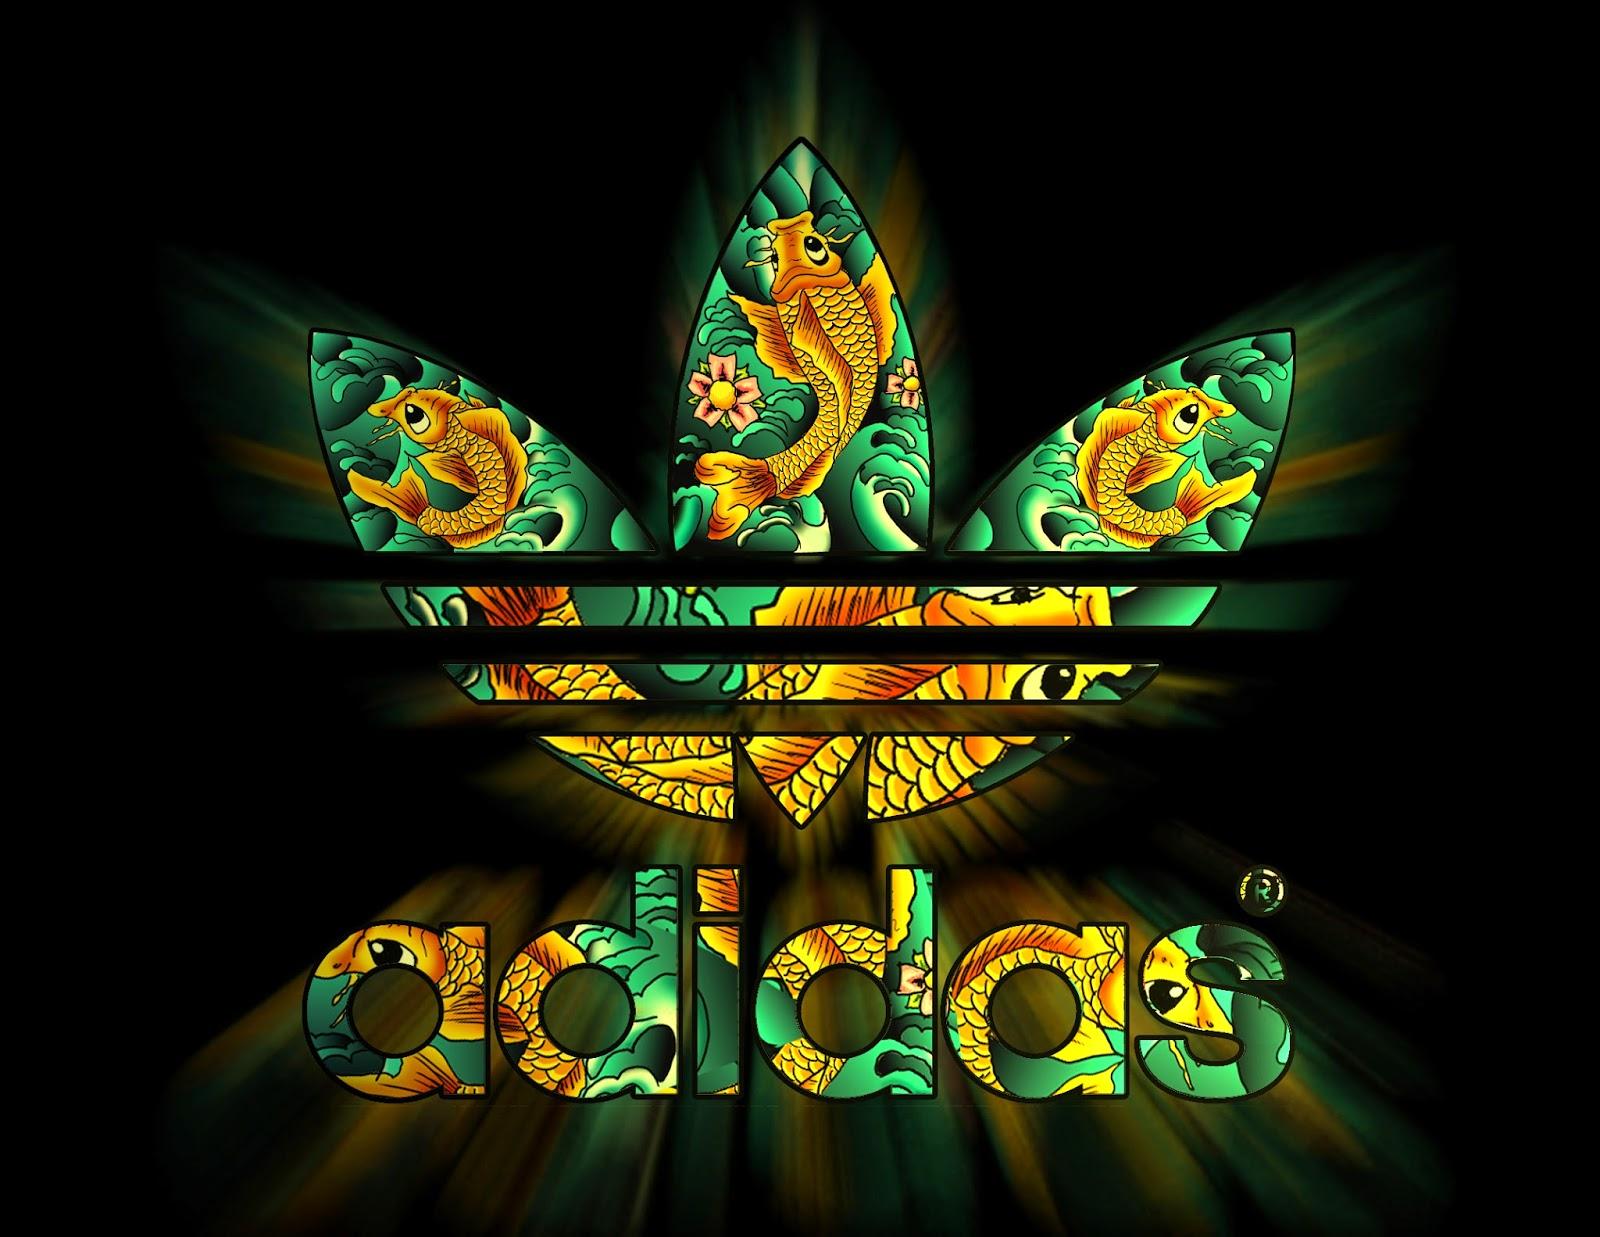 Logos For Adidas Logo Rasta Fashions Feel Tips And Body Care